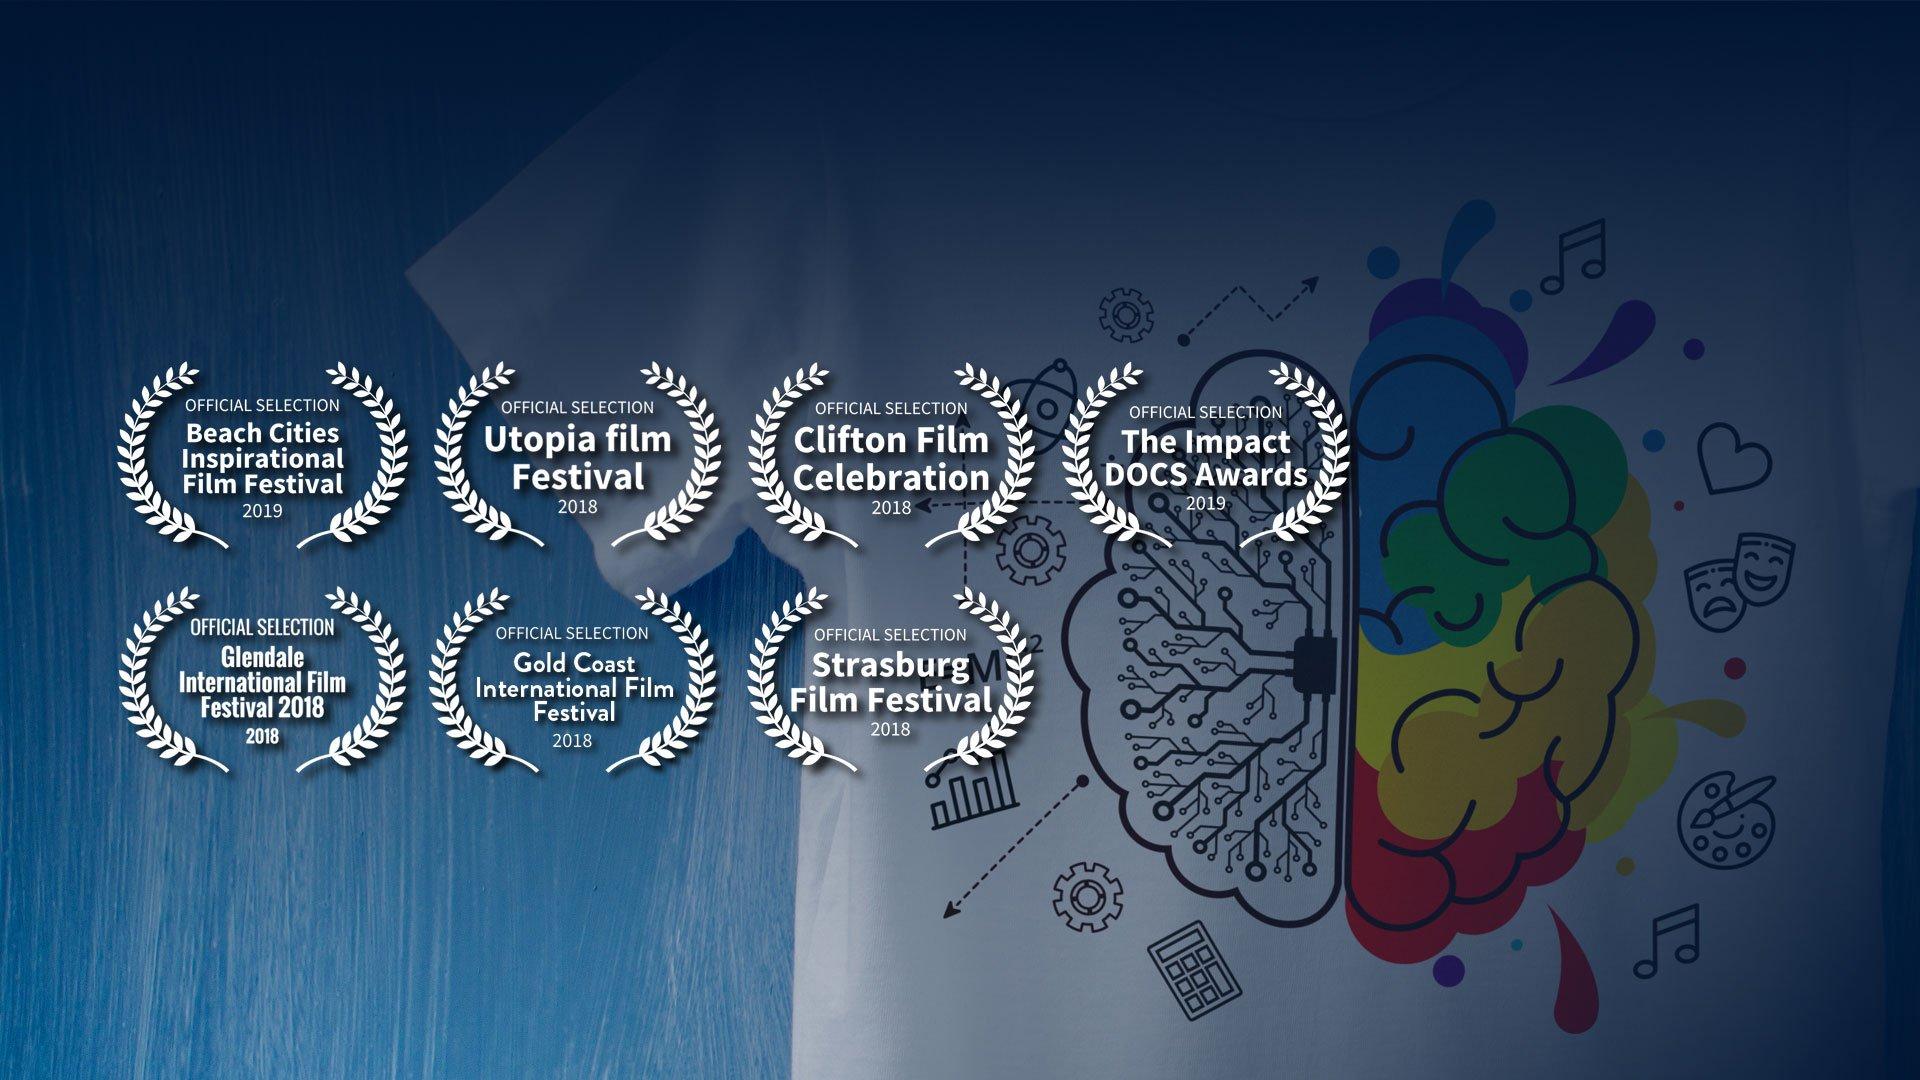 official selection impact docs awards